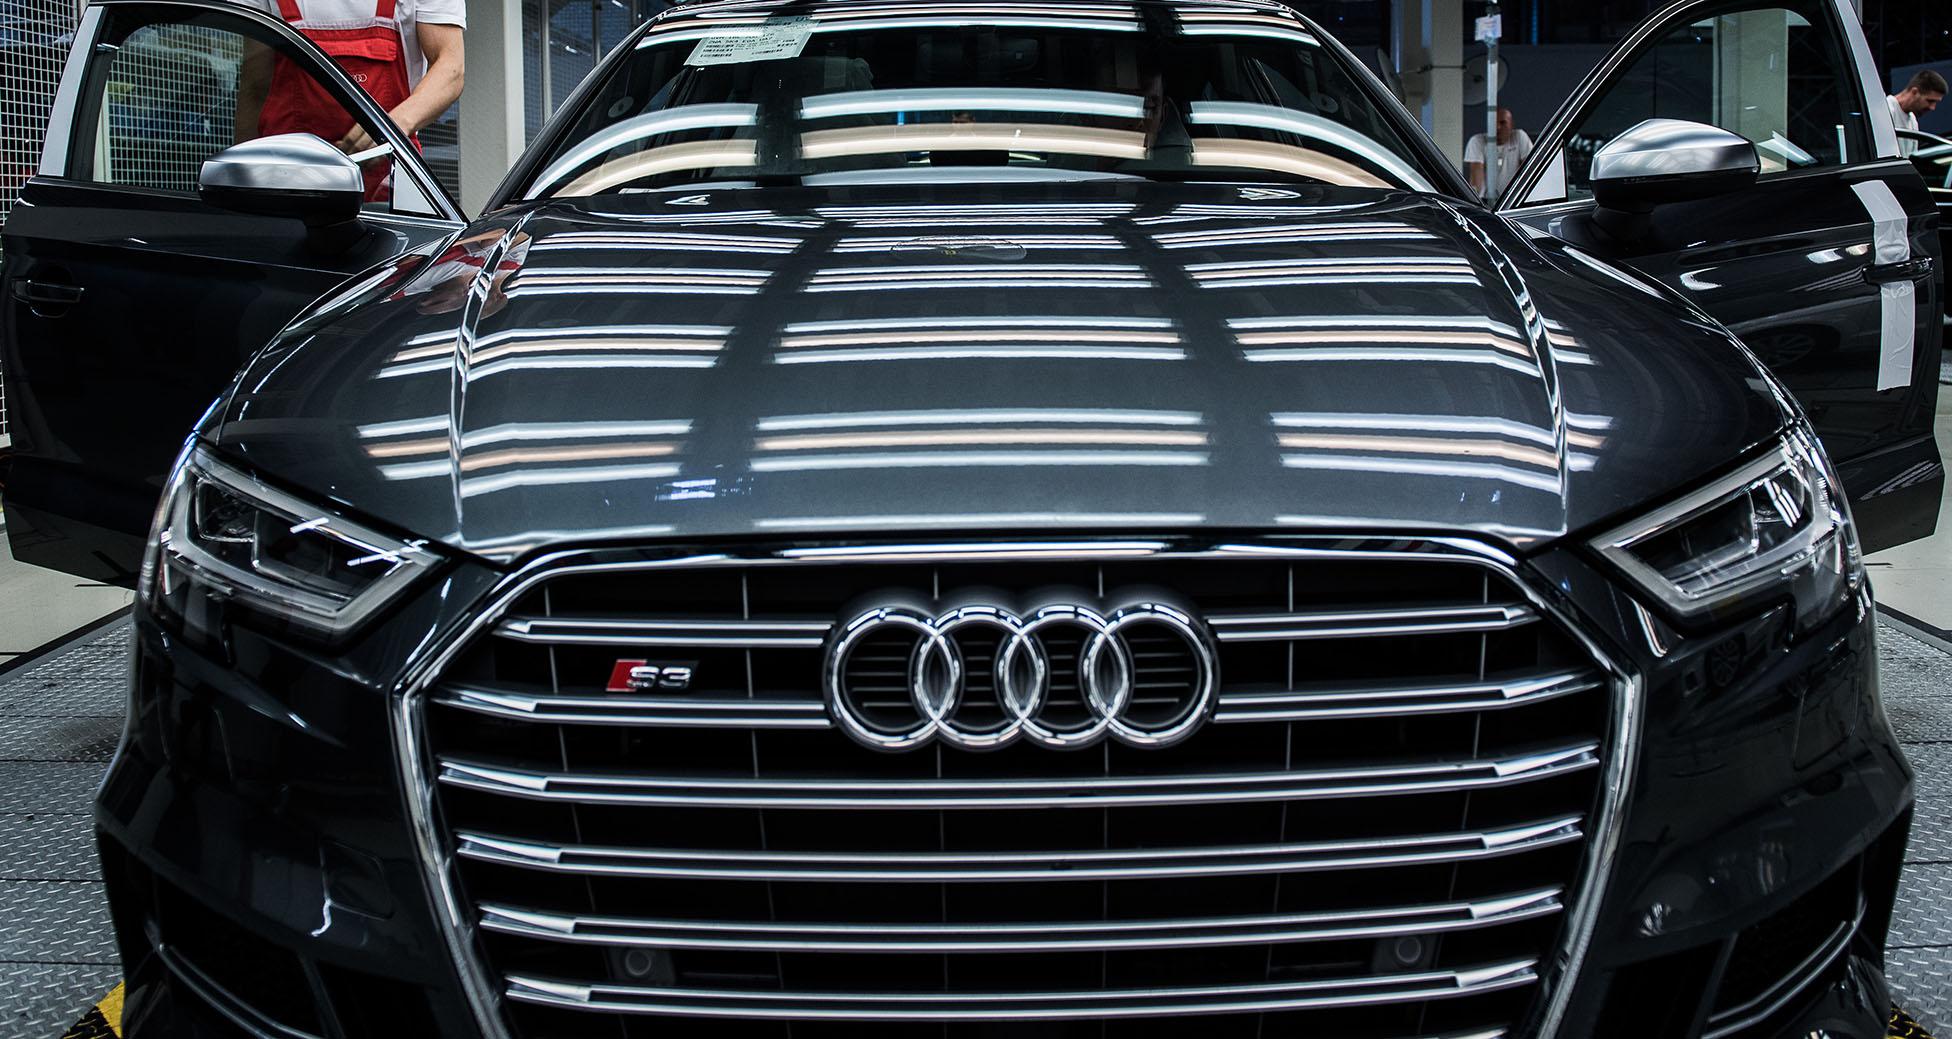 Audi To Skip Detroit Auto Show Joining BMW MercedesBenz - Audi detroit